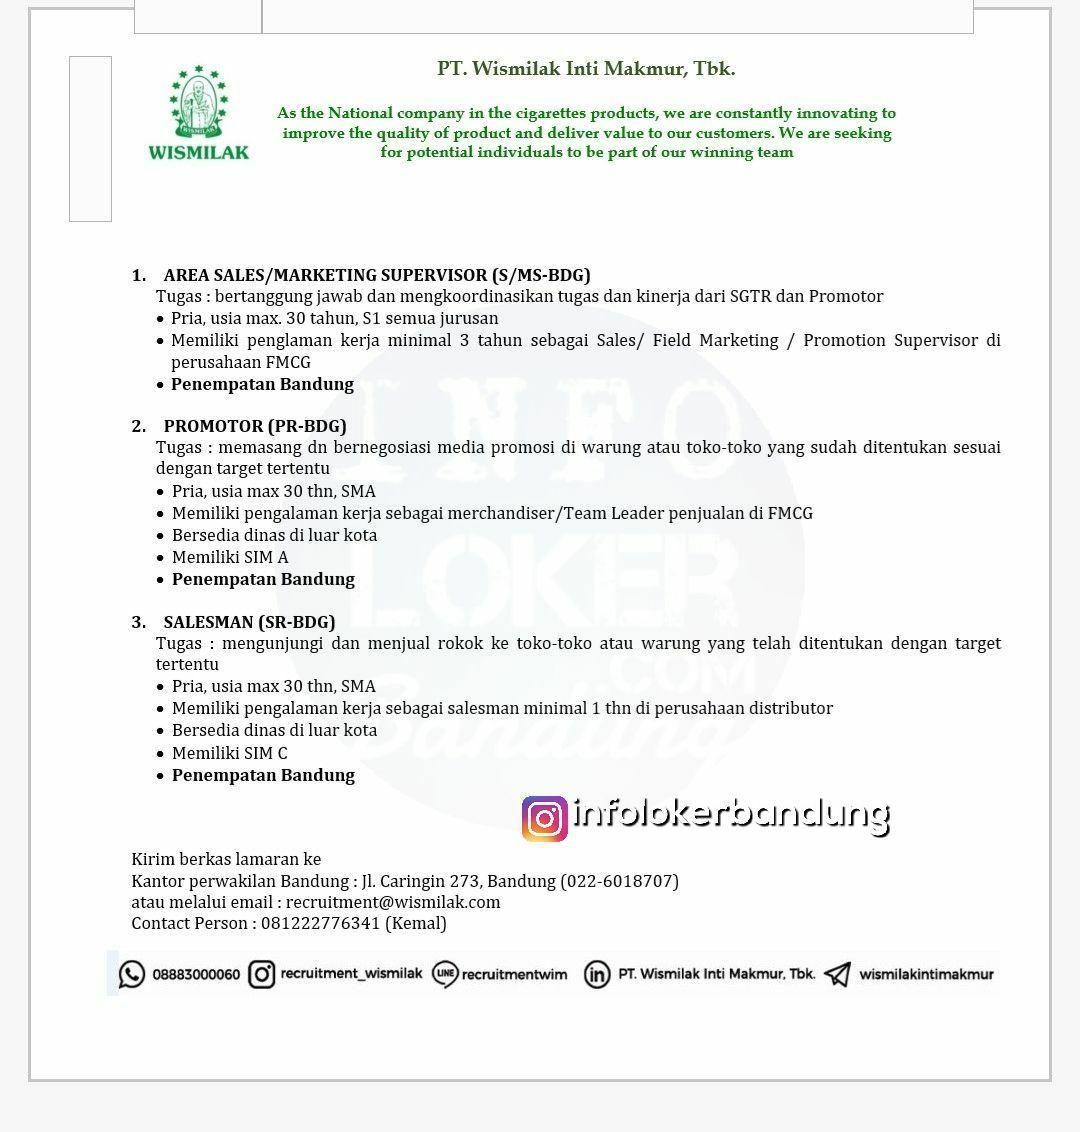 Lowongan Kerja Pt Wismilak Inti Makmur Tbk Bandung Maret 2018